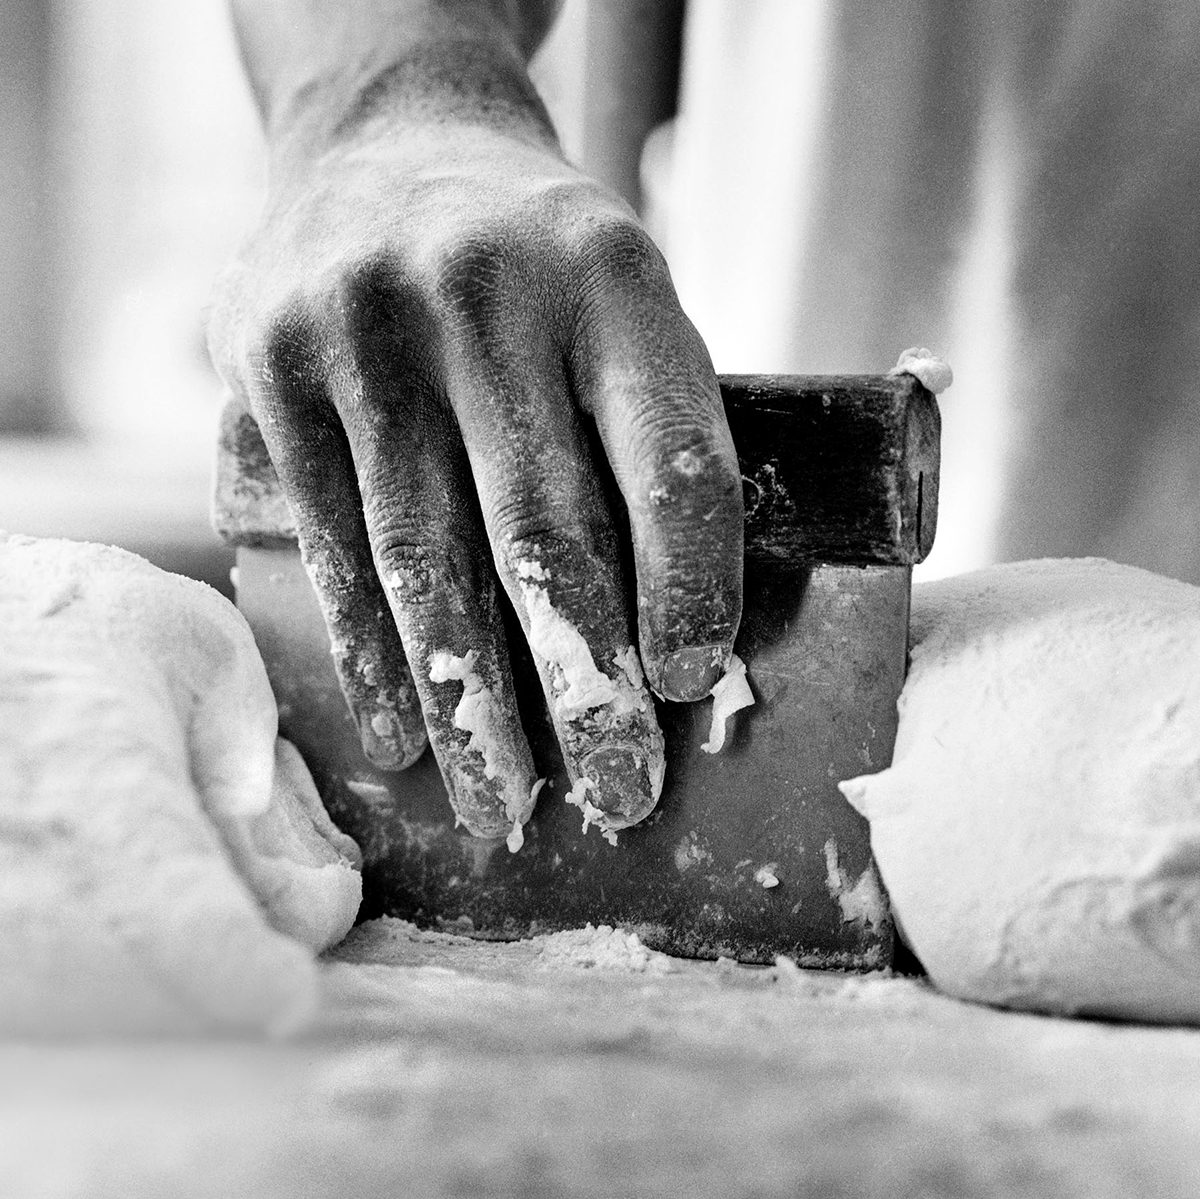 bench scraper hand dough